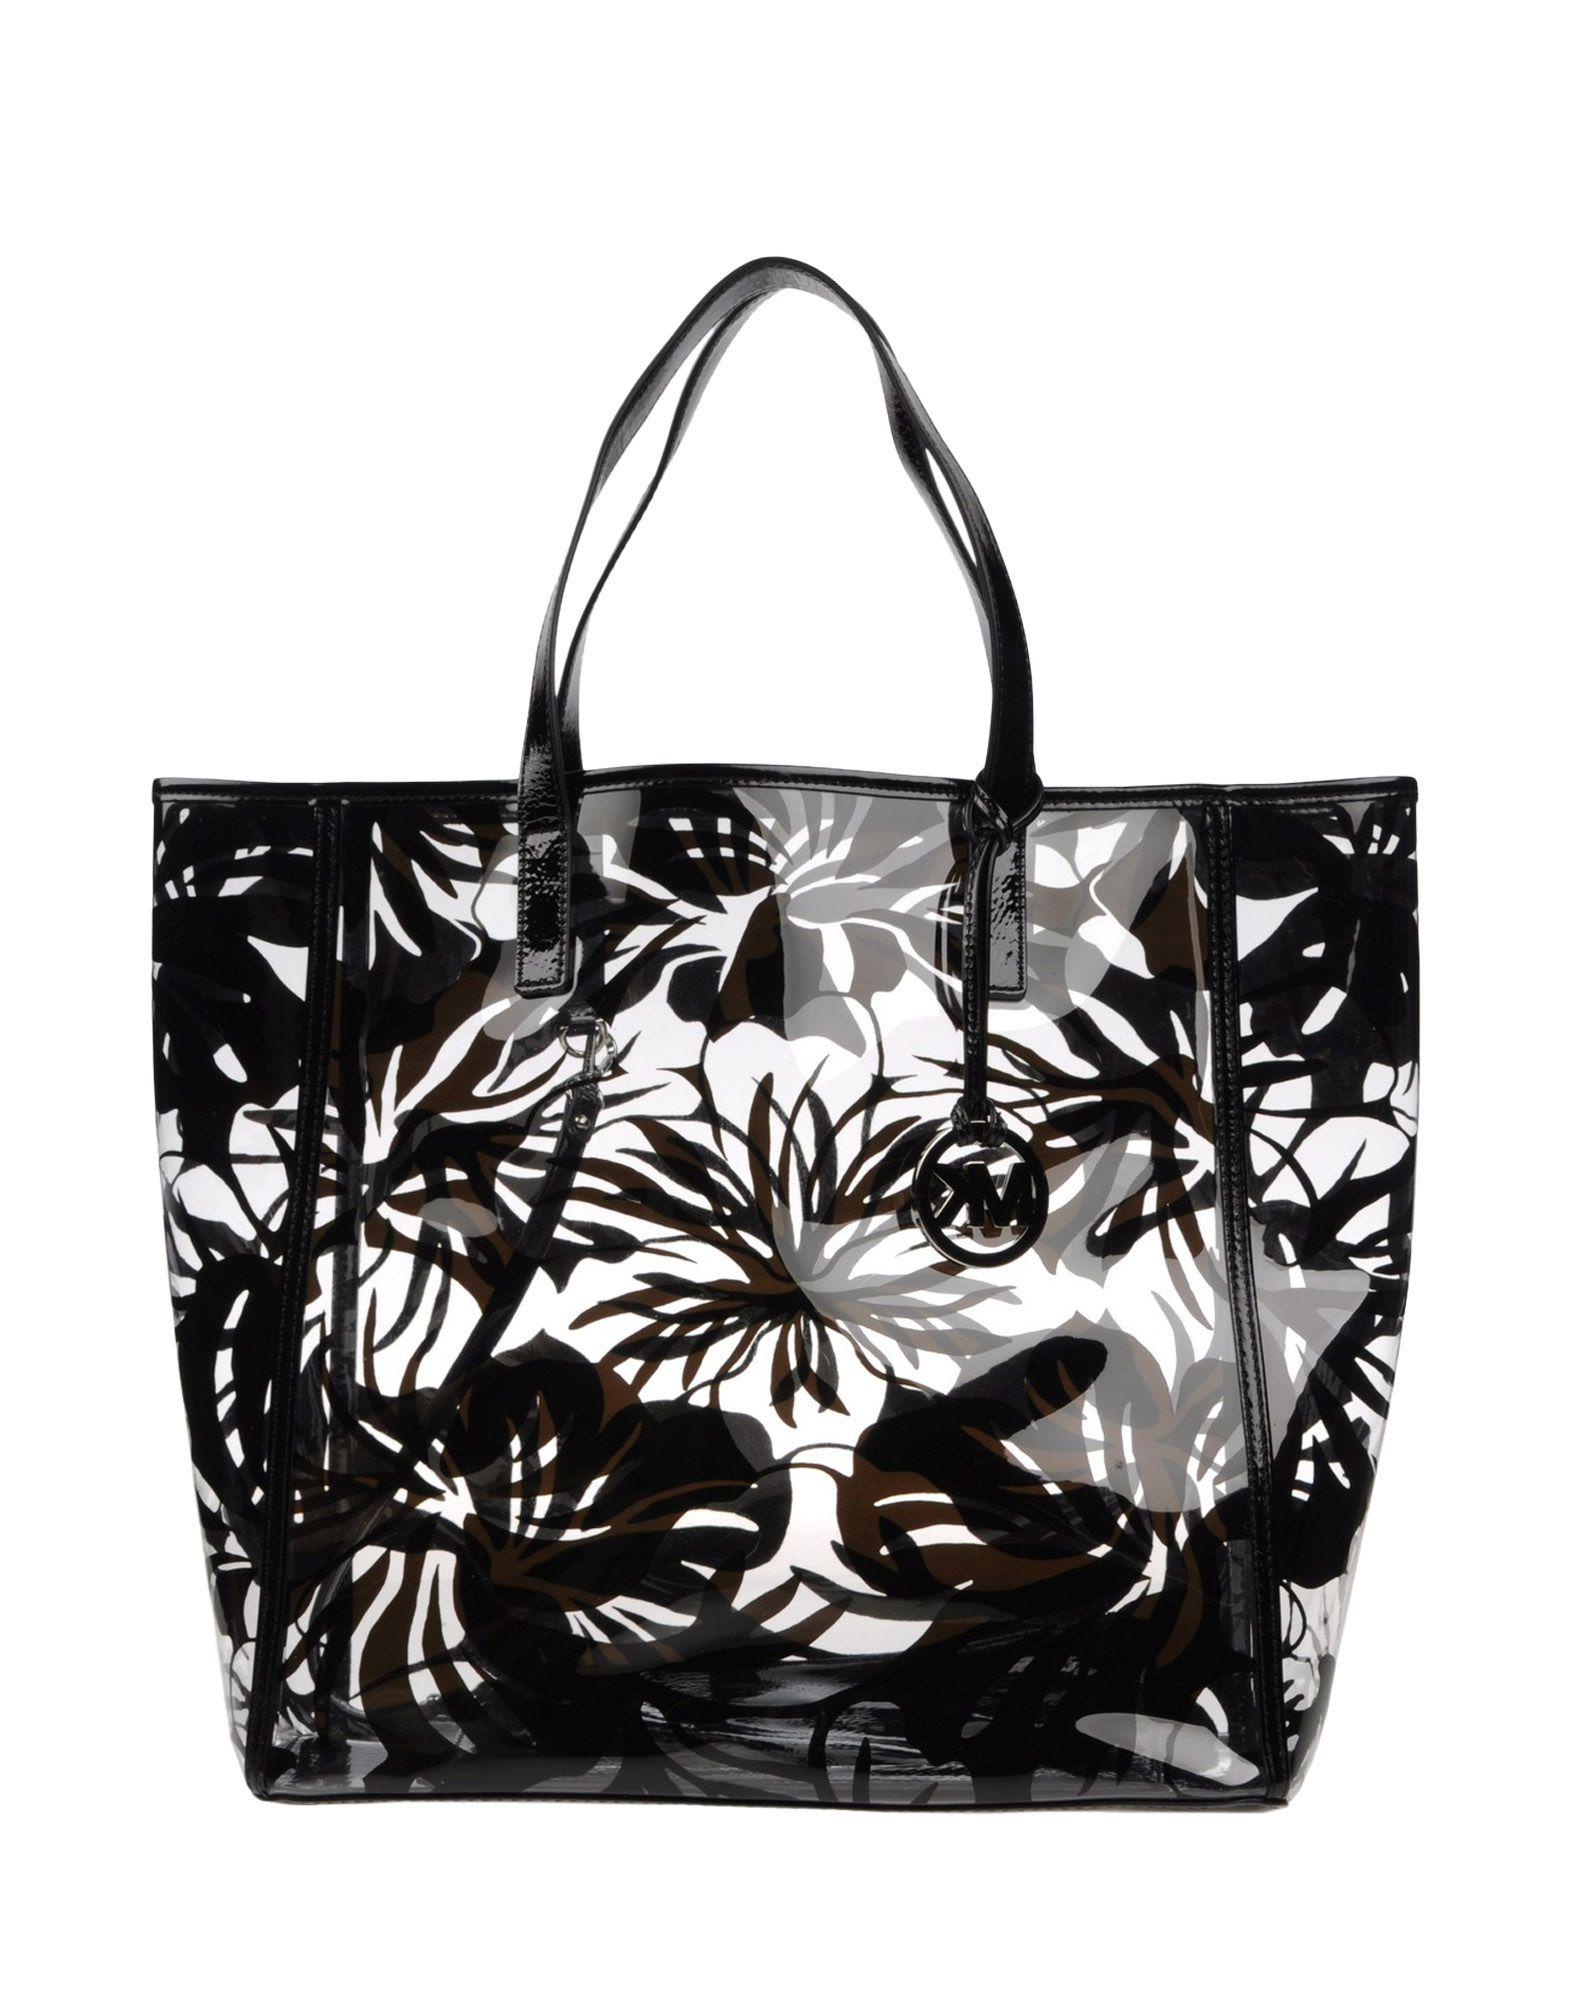 MICHAEL MICHAEL KORS Handbags